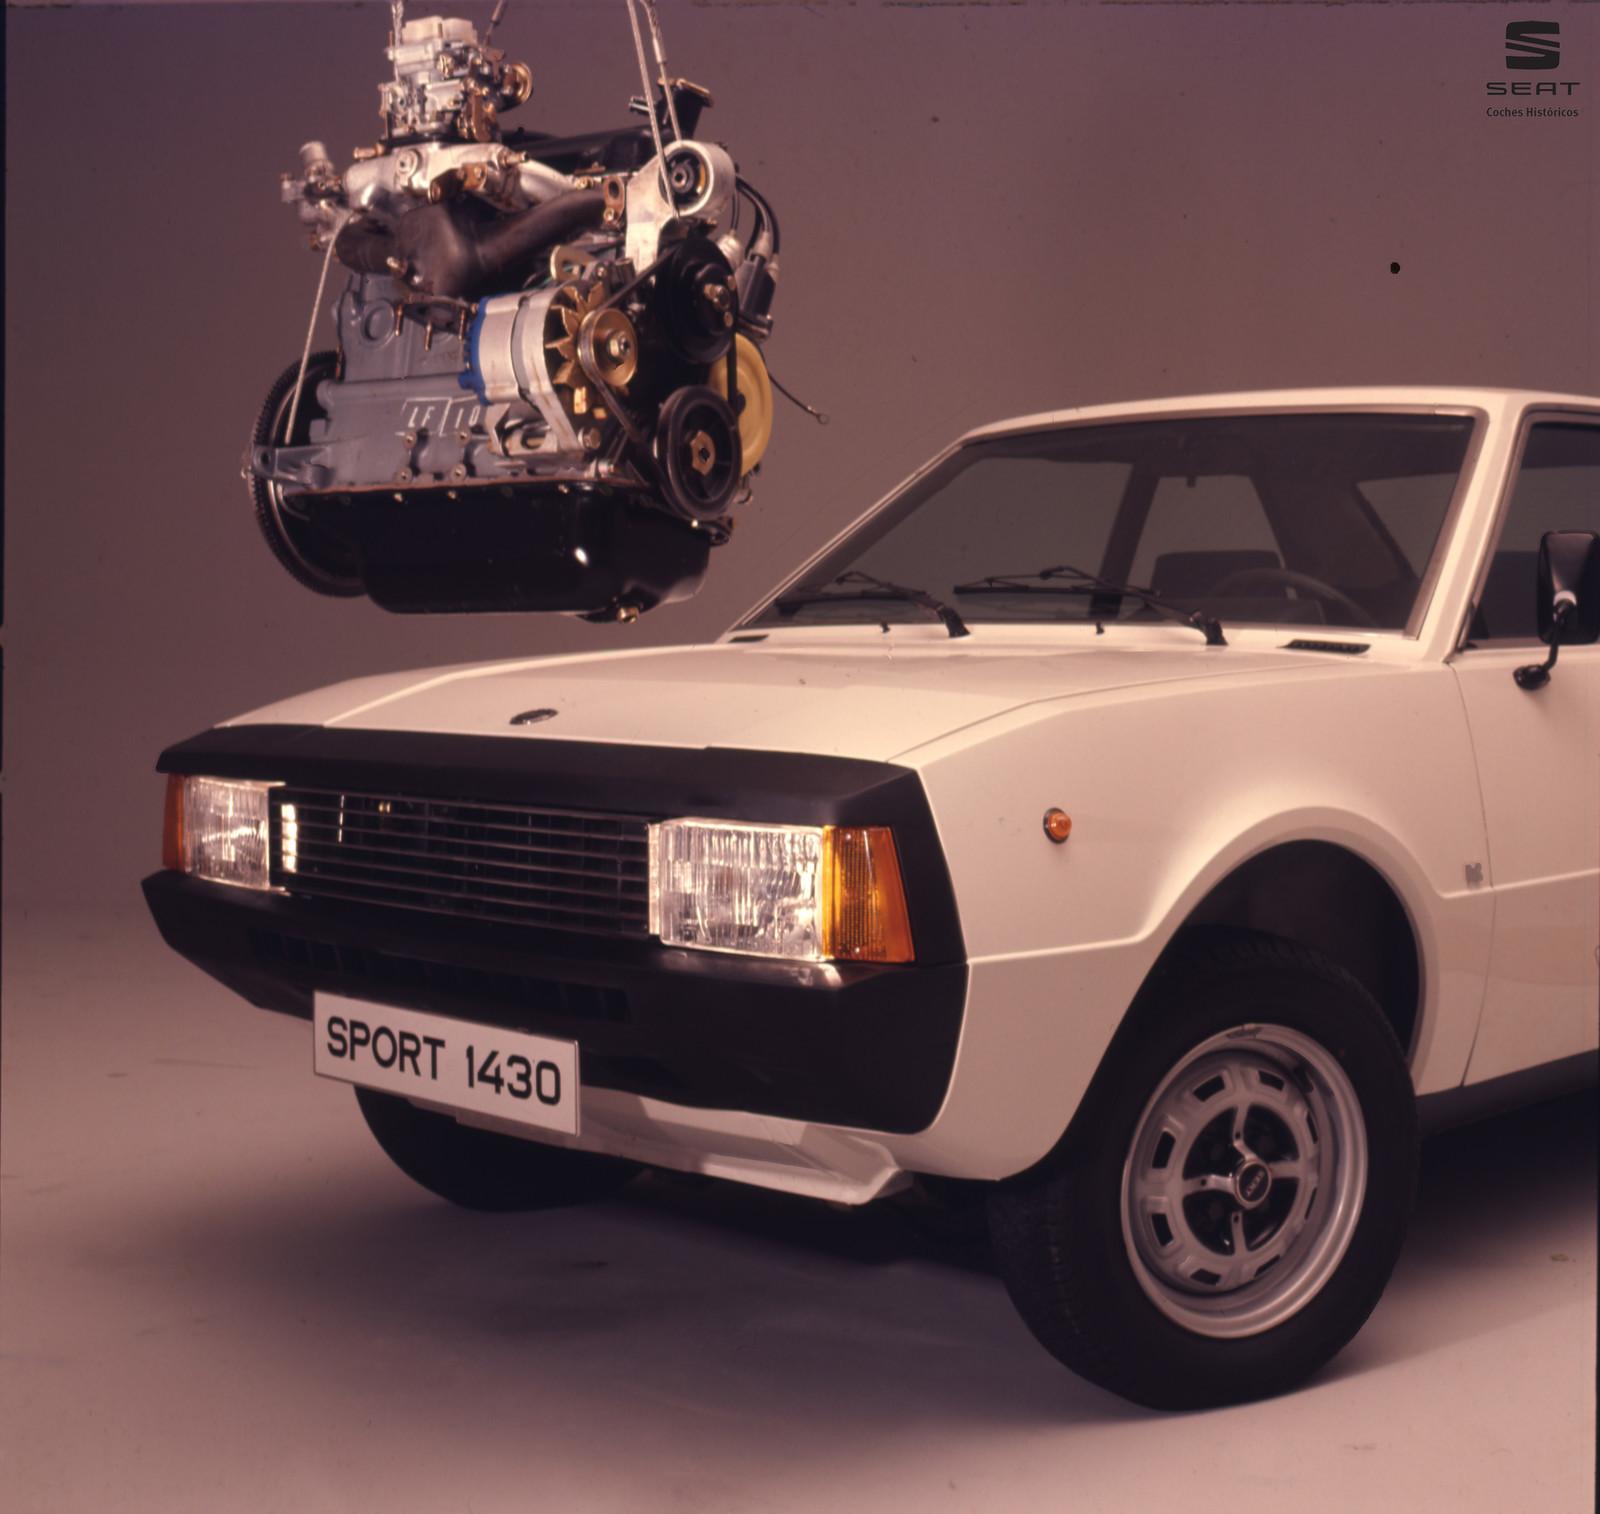 Foto de Motor SEAT 1430 - fotos históricas (32/49)